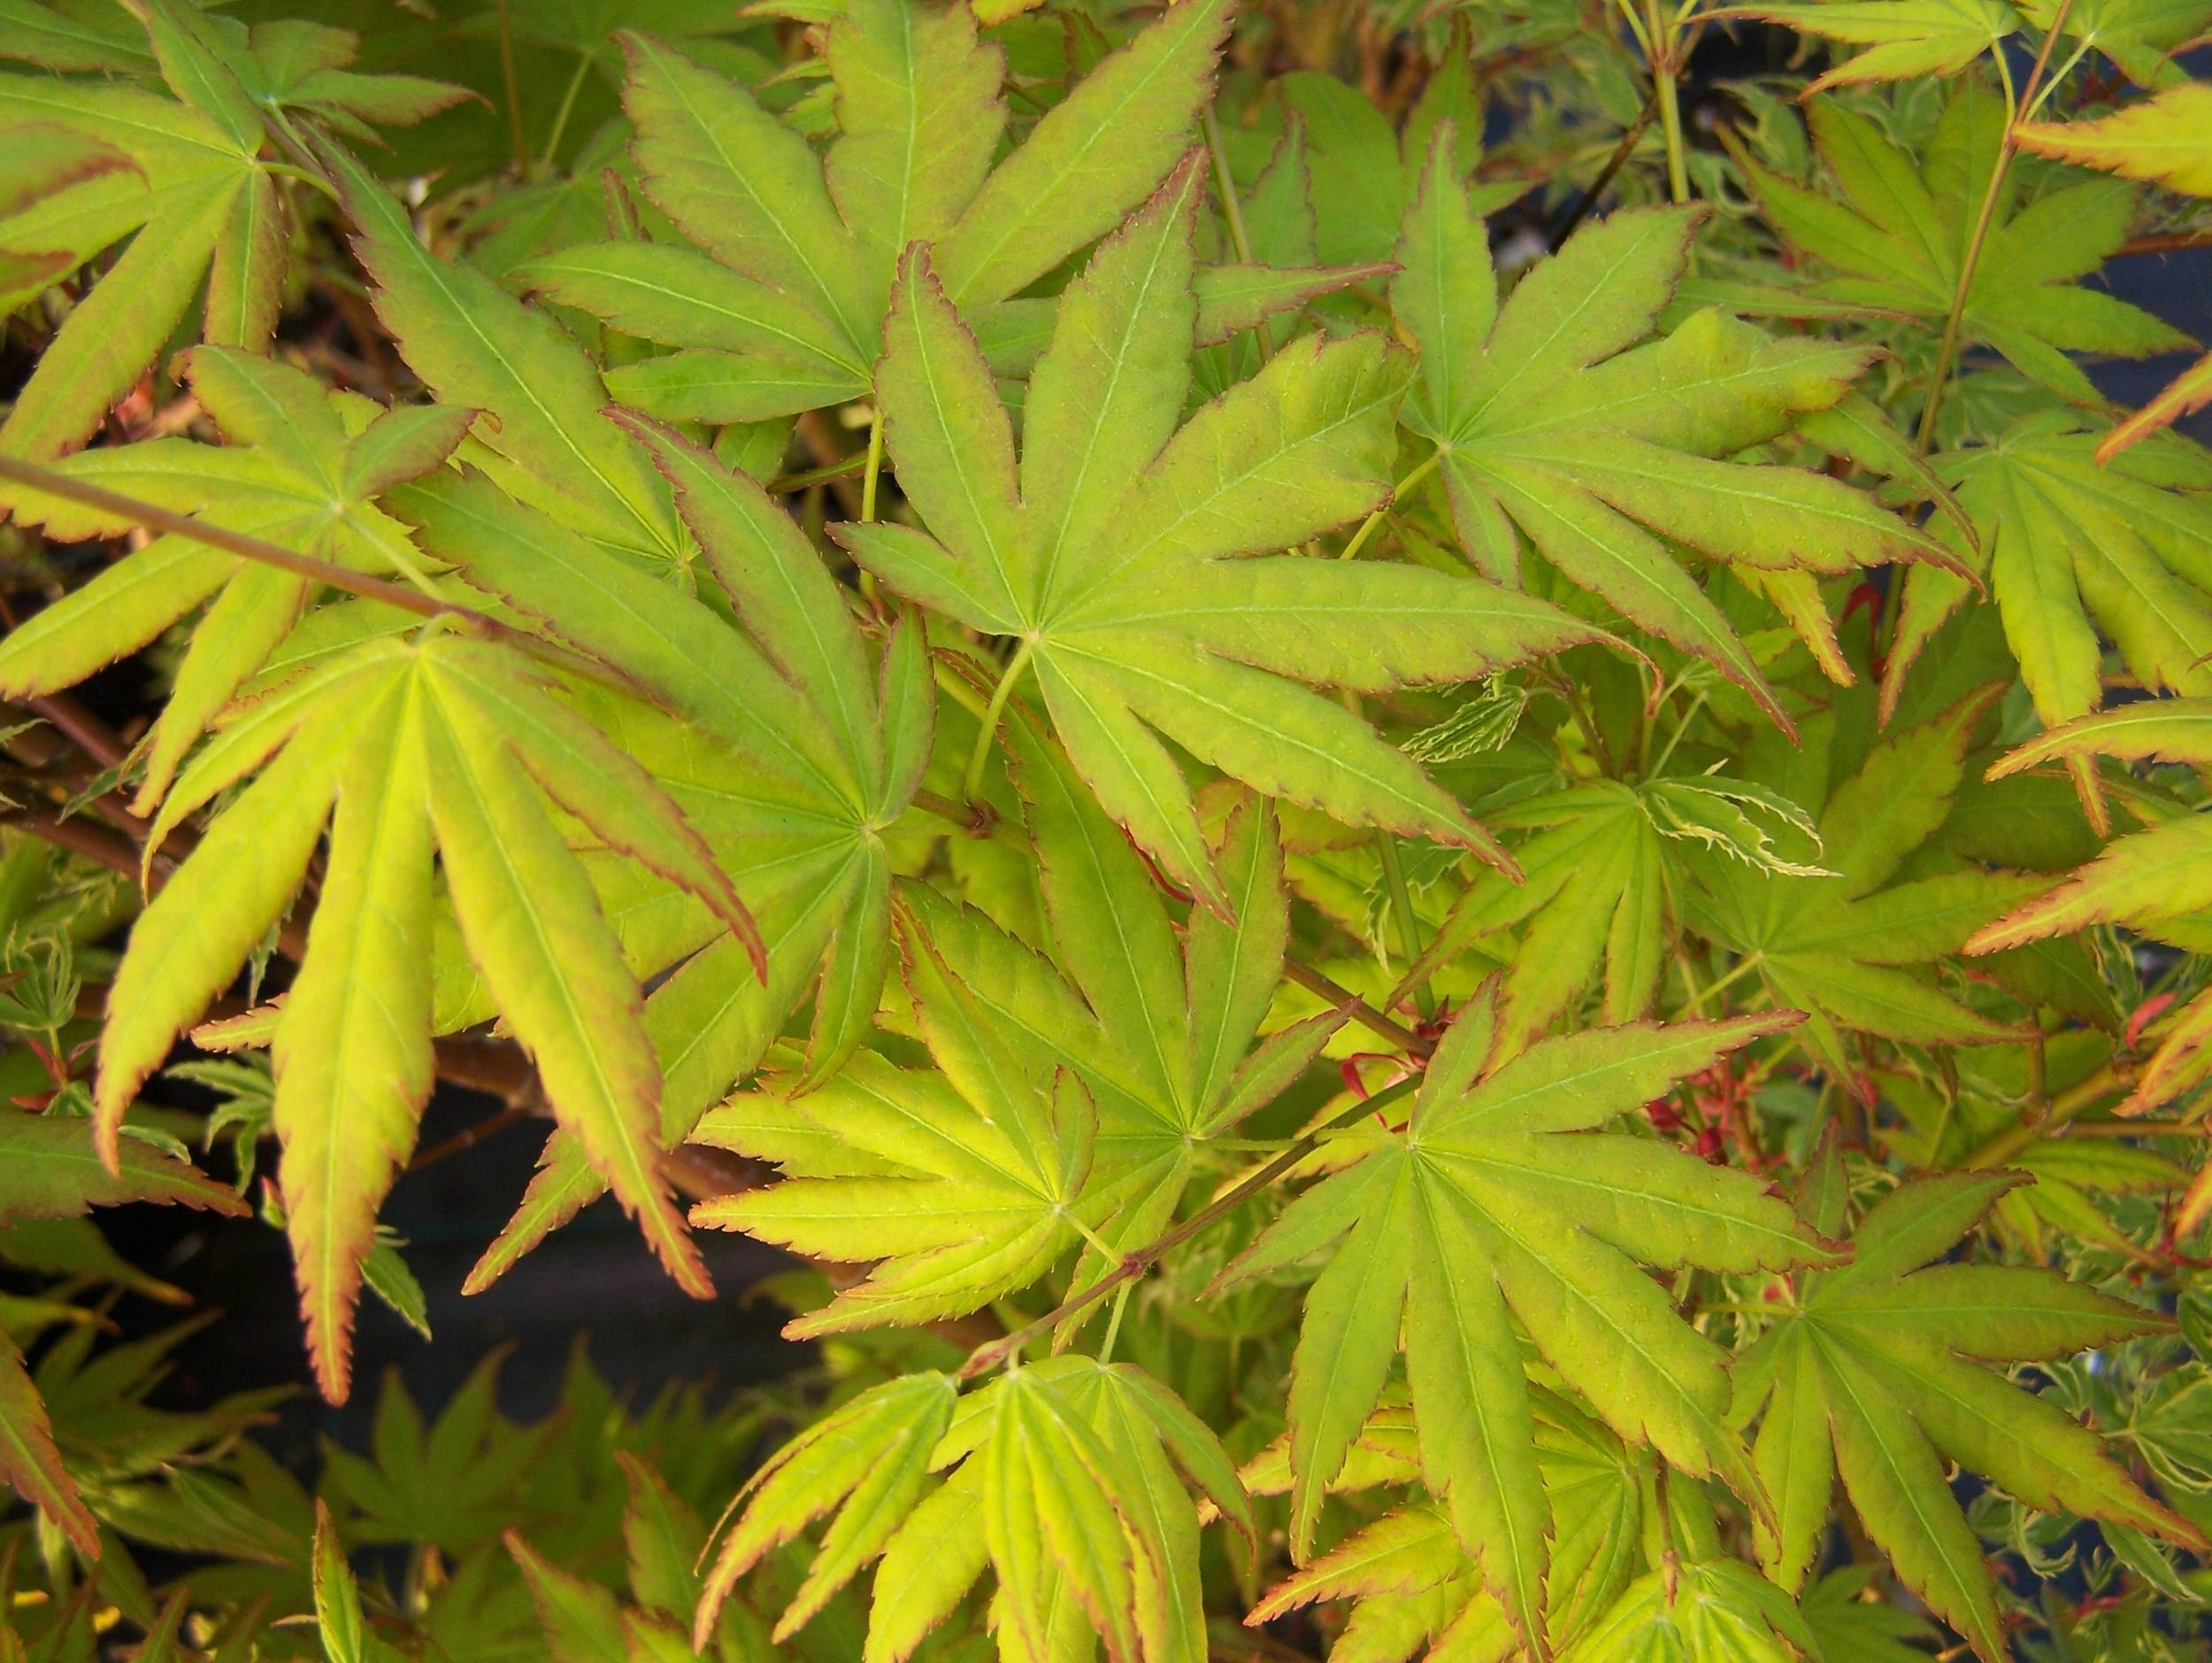 Acer p. 'Katsura' closeup of leaves